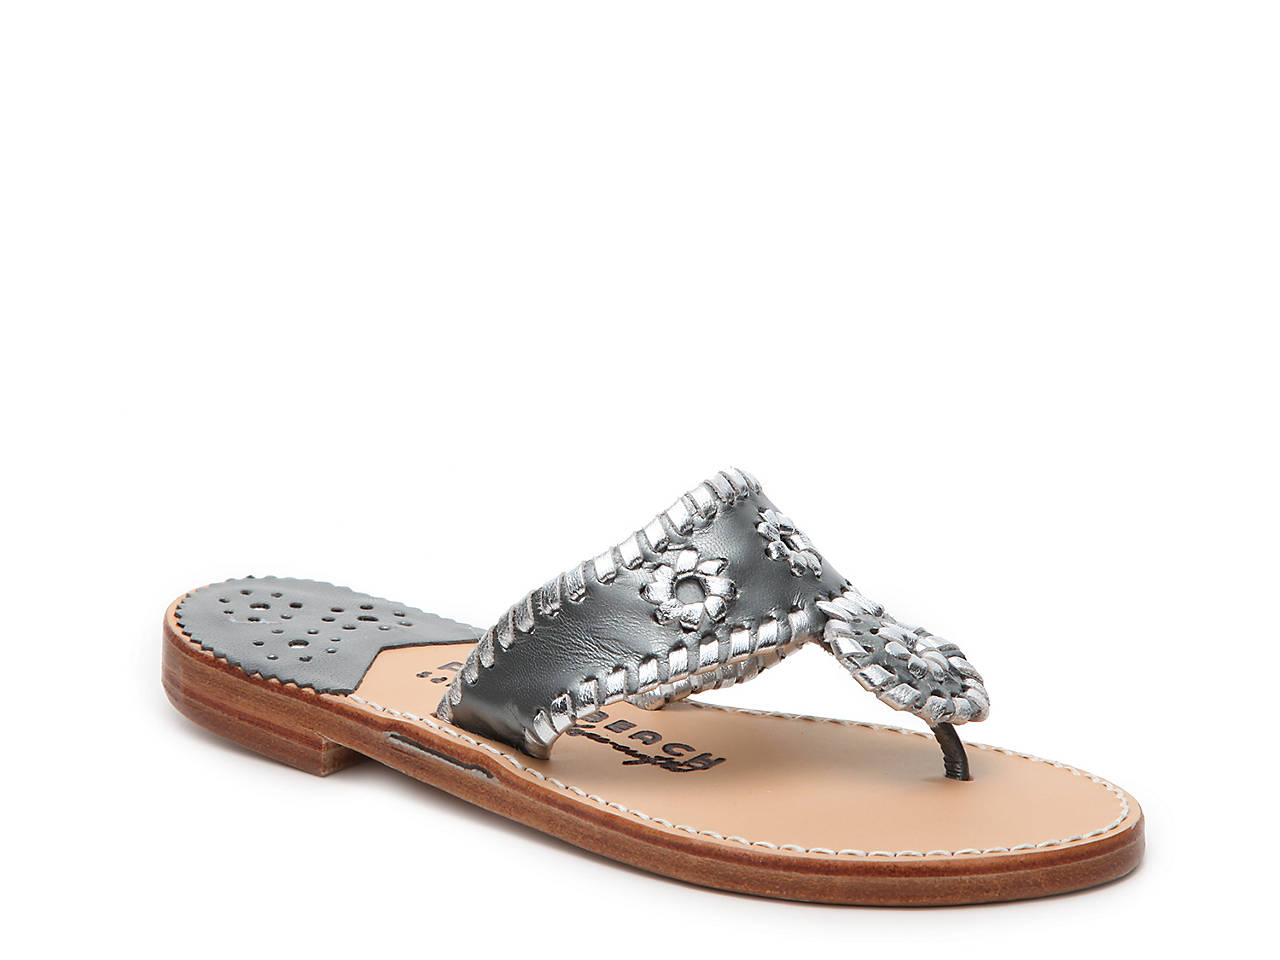 4b2f8400106e97 Palm Beach Sandals Classic Flat Sandal Women s Shoes